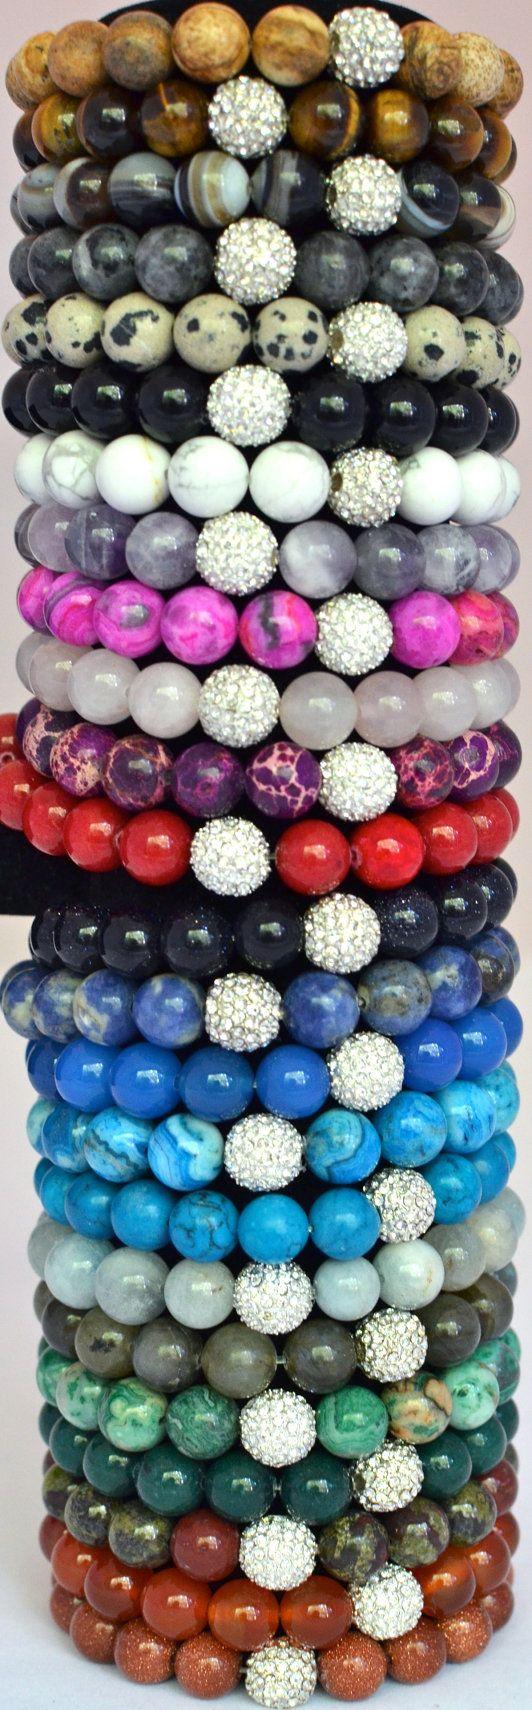 Best 25+ Gemstone beads ideas on Pinterest | Names of gemstones ...